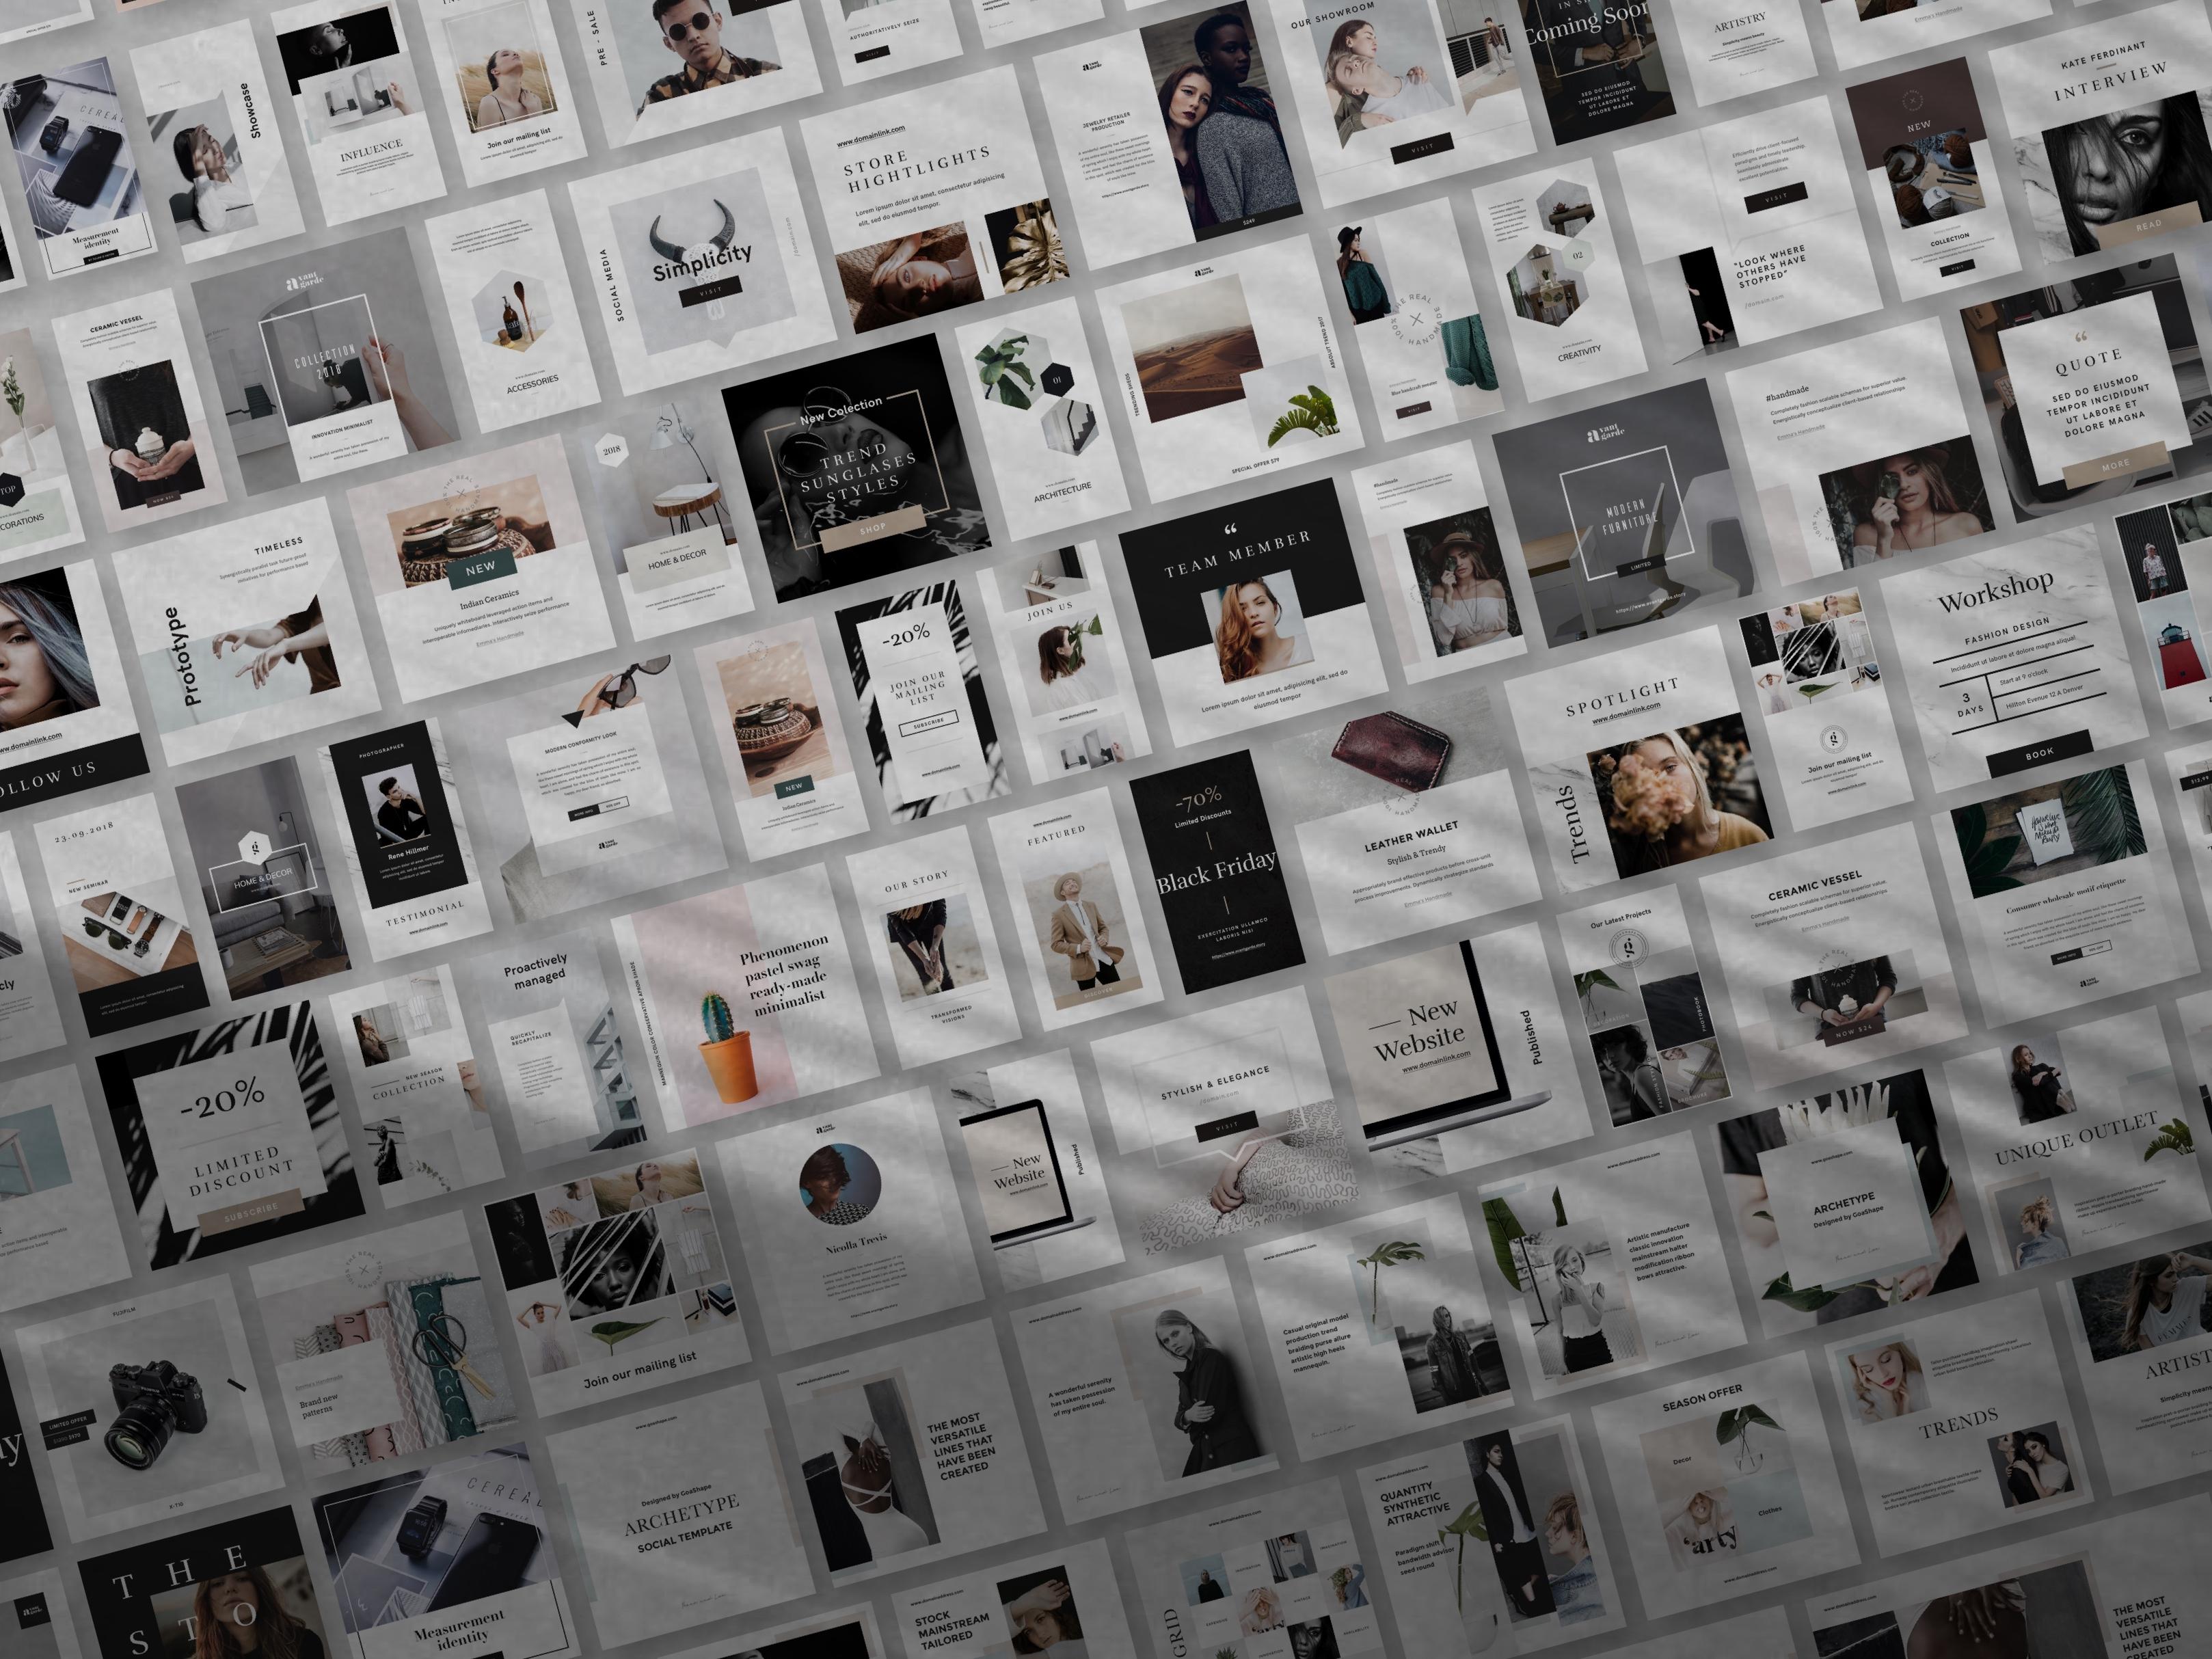 Social media bundle showcase